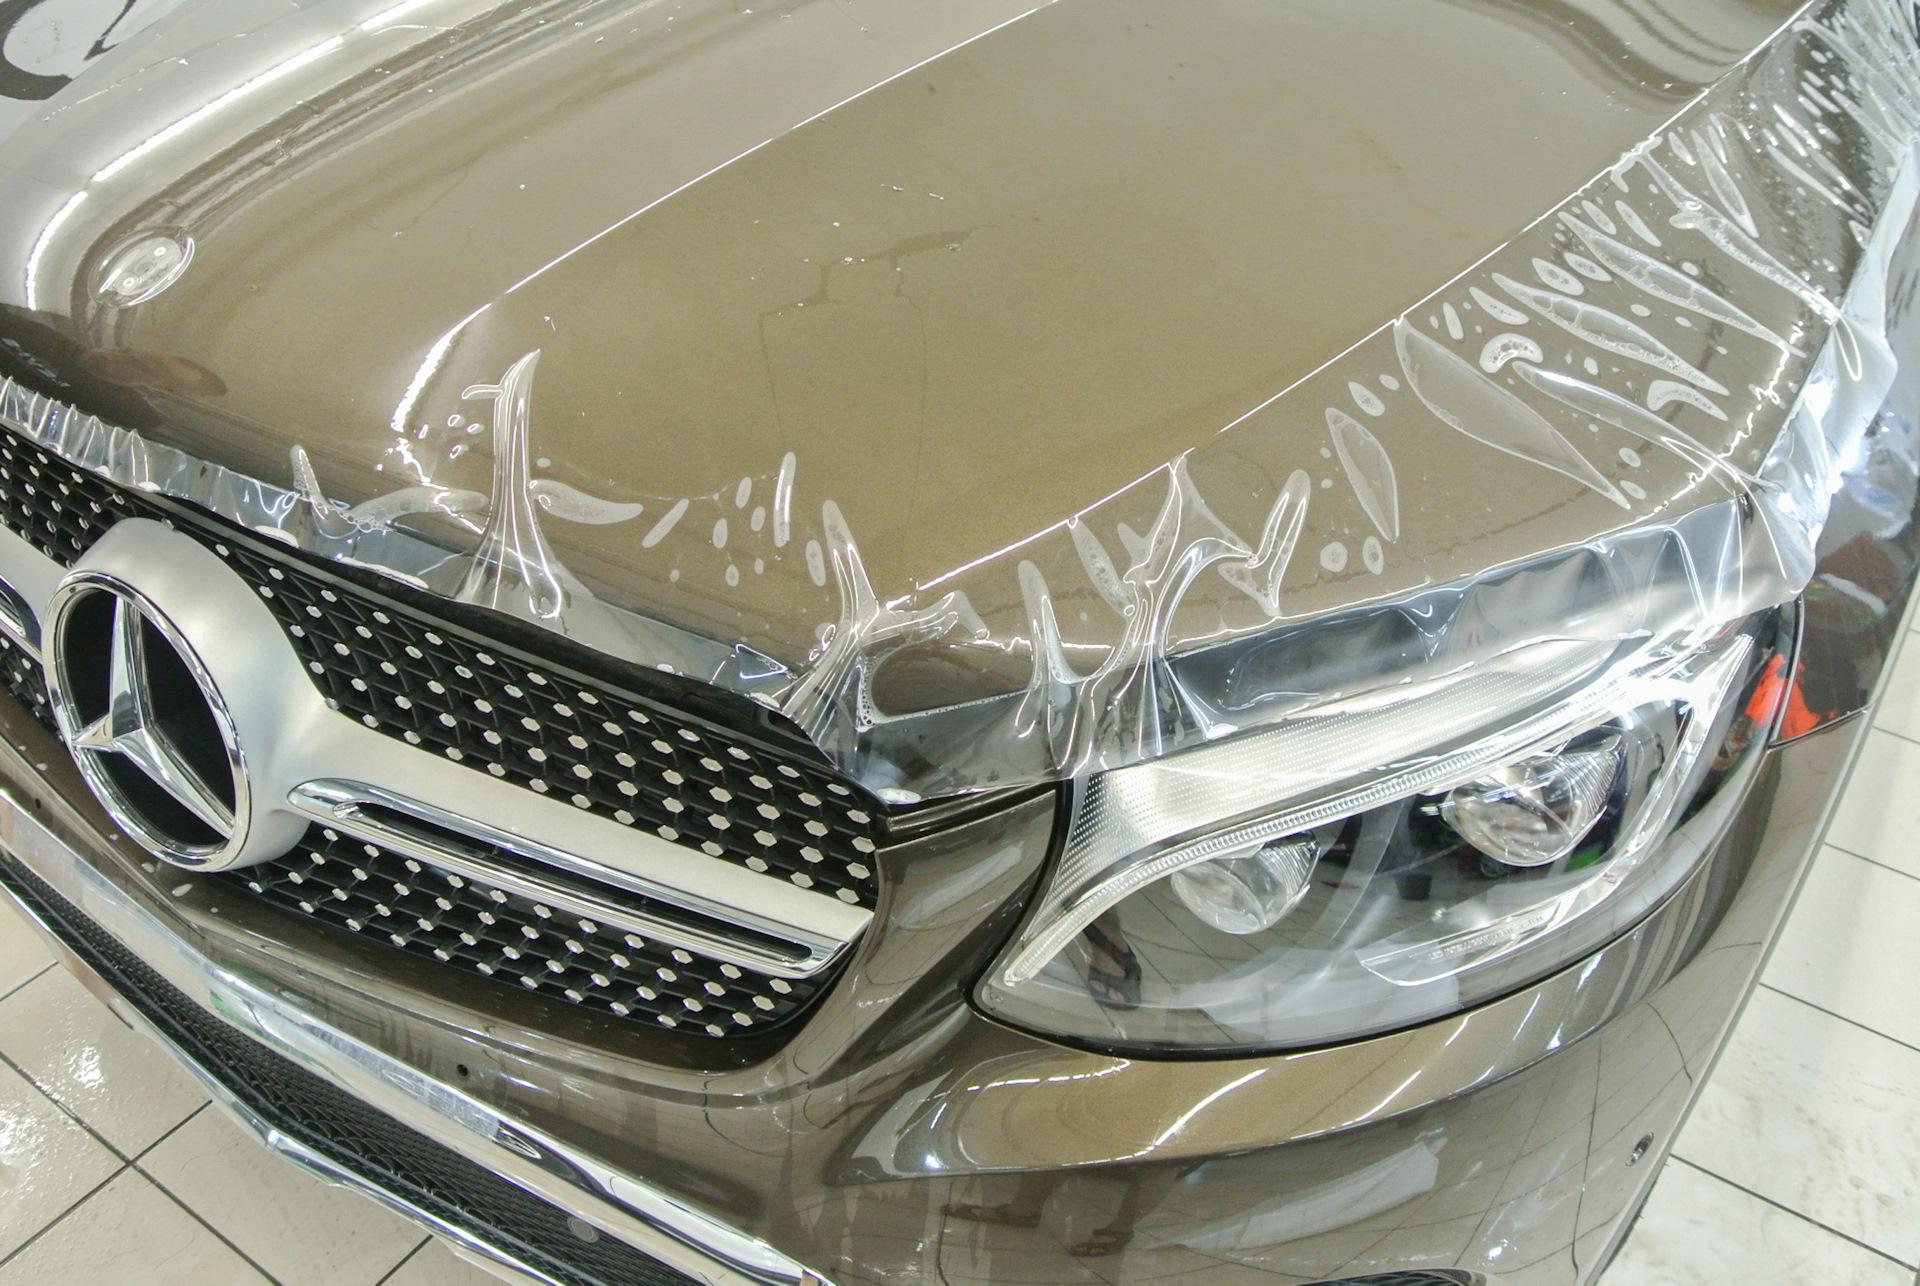 Znalezione obrazy dla zapytania: Полиуретановая пленка — надежная защита для автомобиля